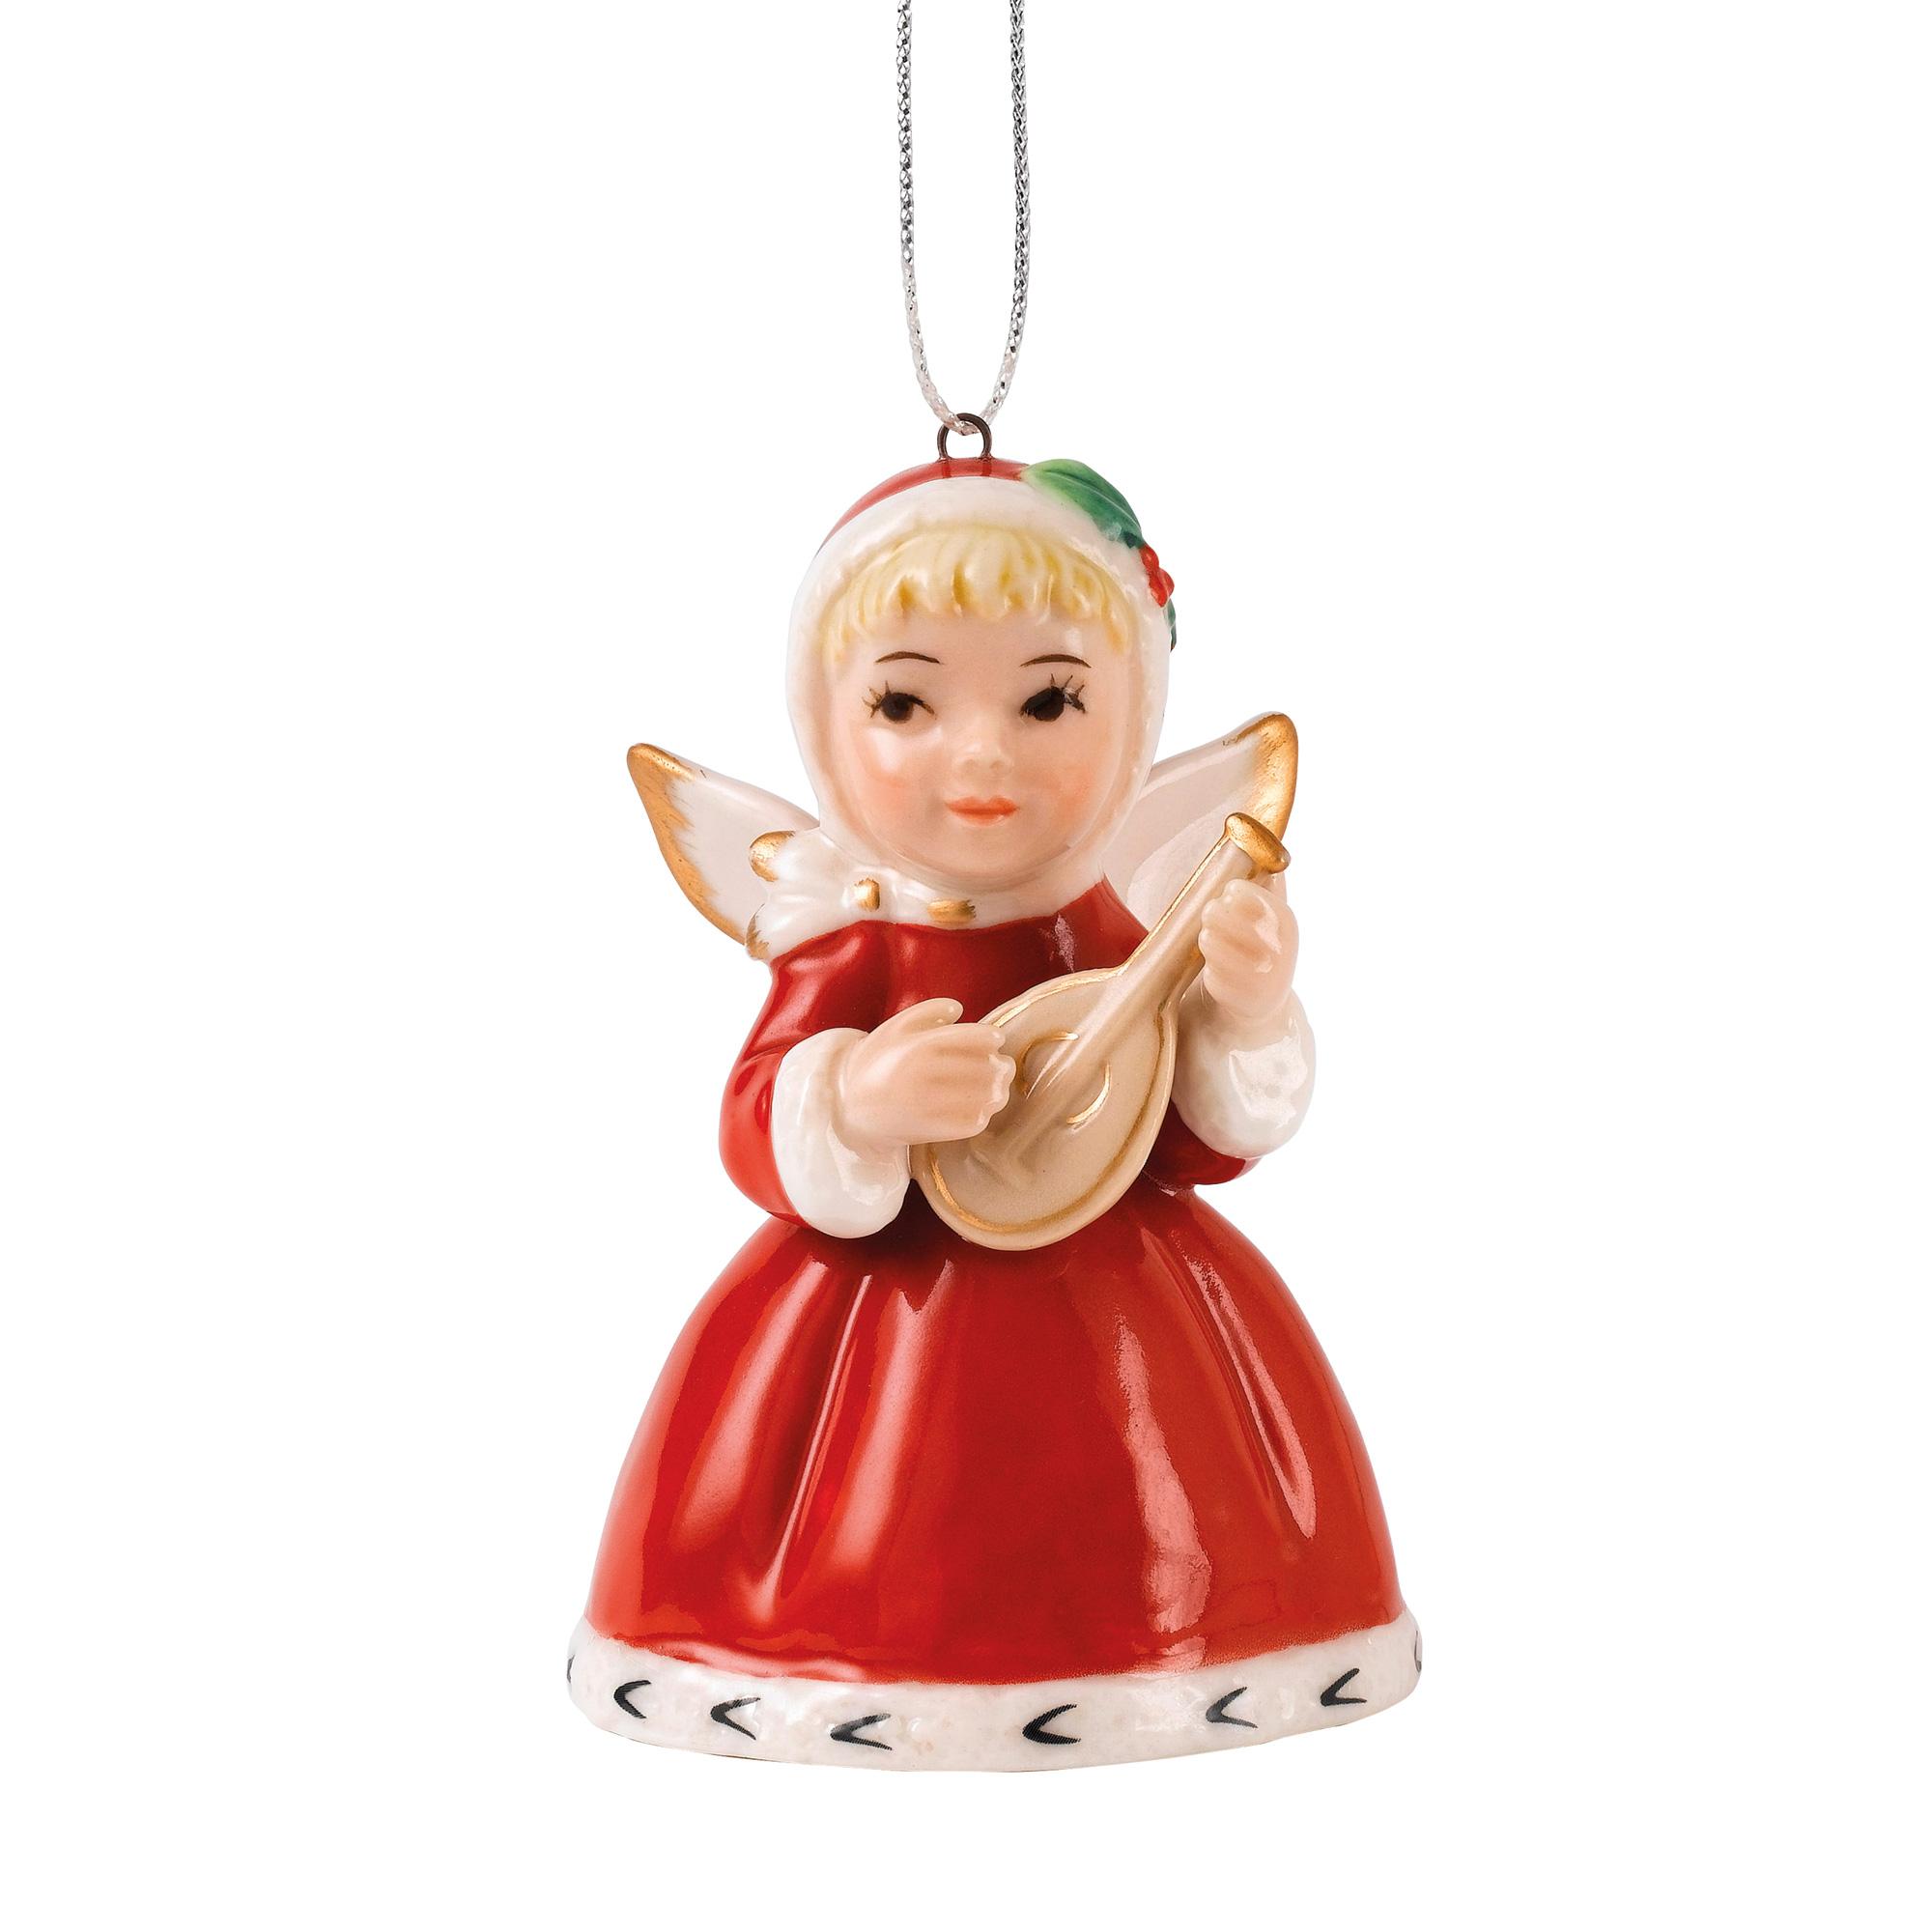 Angel Ornament - Royal Doulton Ornament